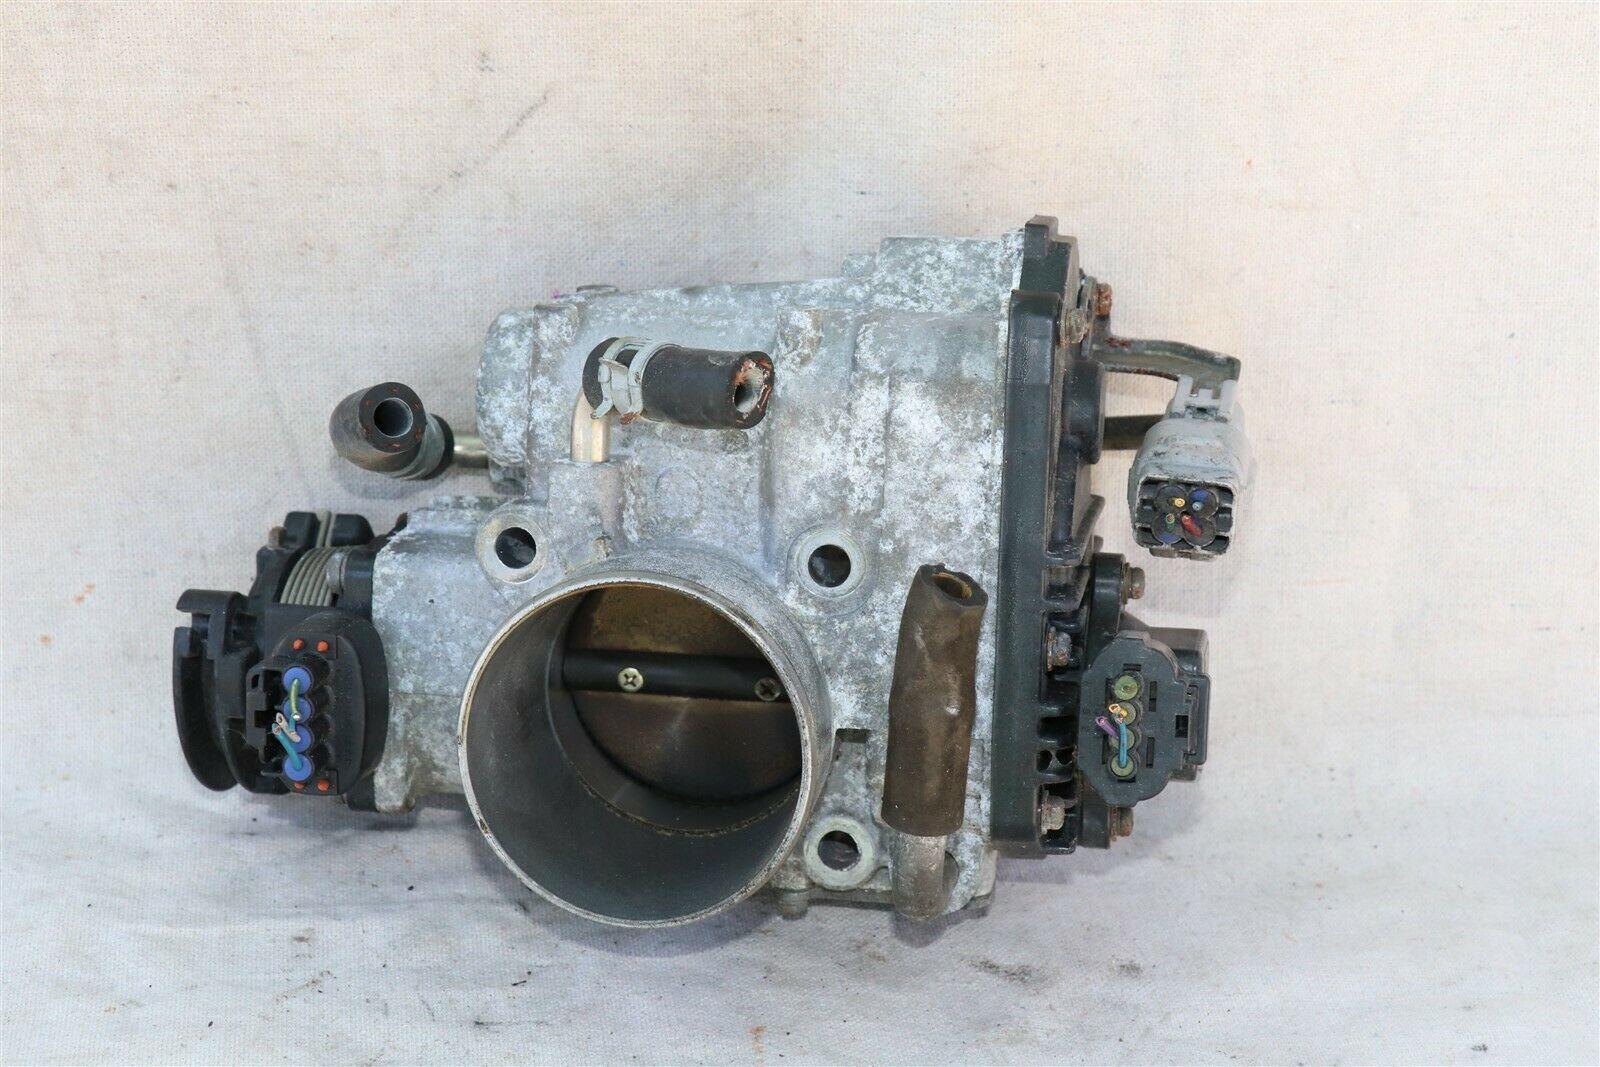 01-02 Toyota 4Runner 02-04 Tacoma Tundra 3.4L V6 5VZ Throttle Body Valve TPS